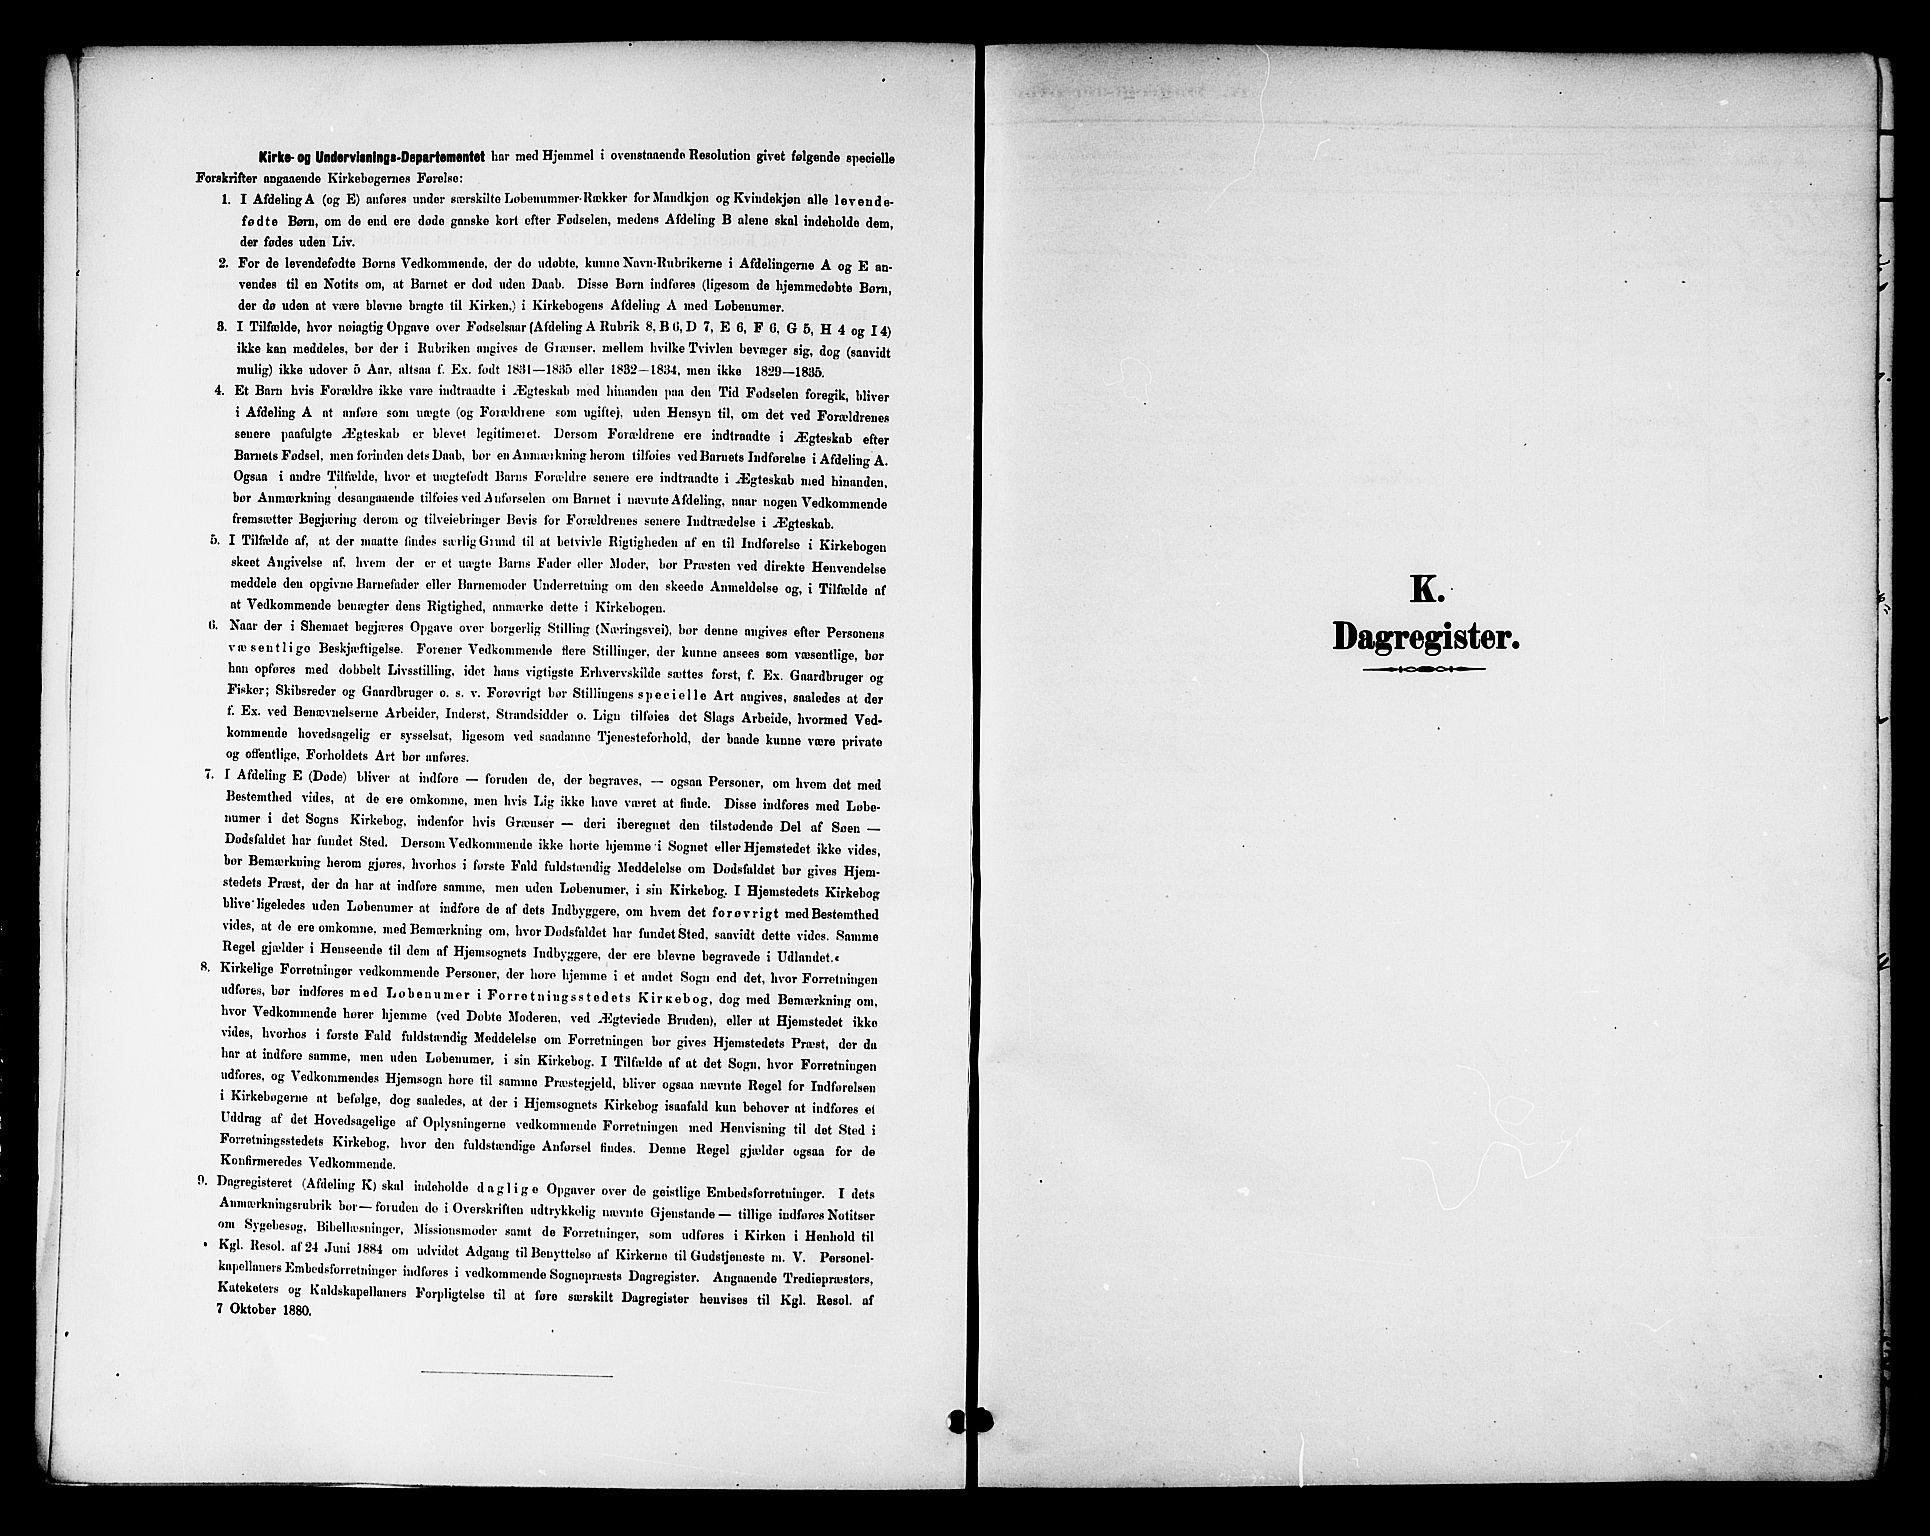 SAT, Ministerialprotokoller, klokkerbøker og fødselsregistre - Nord-Trøndelag, 768/L0575: Dagregister nr. 766A09, 1889-1931